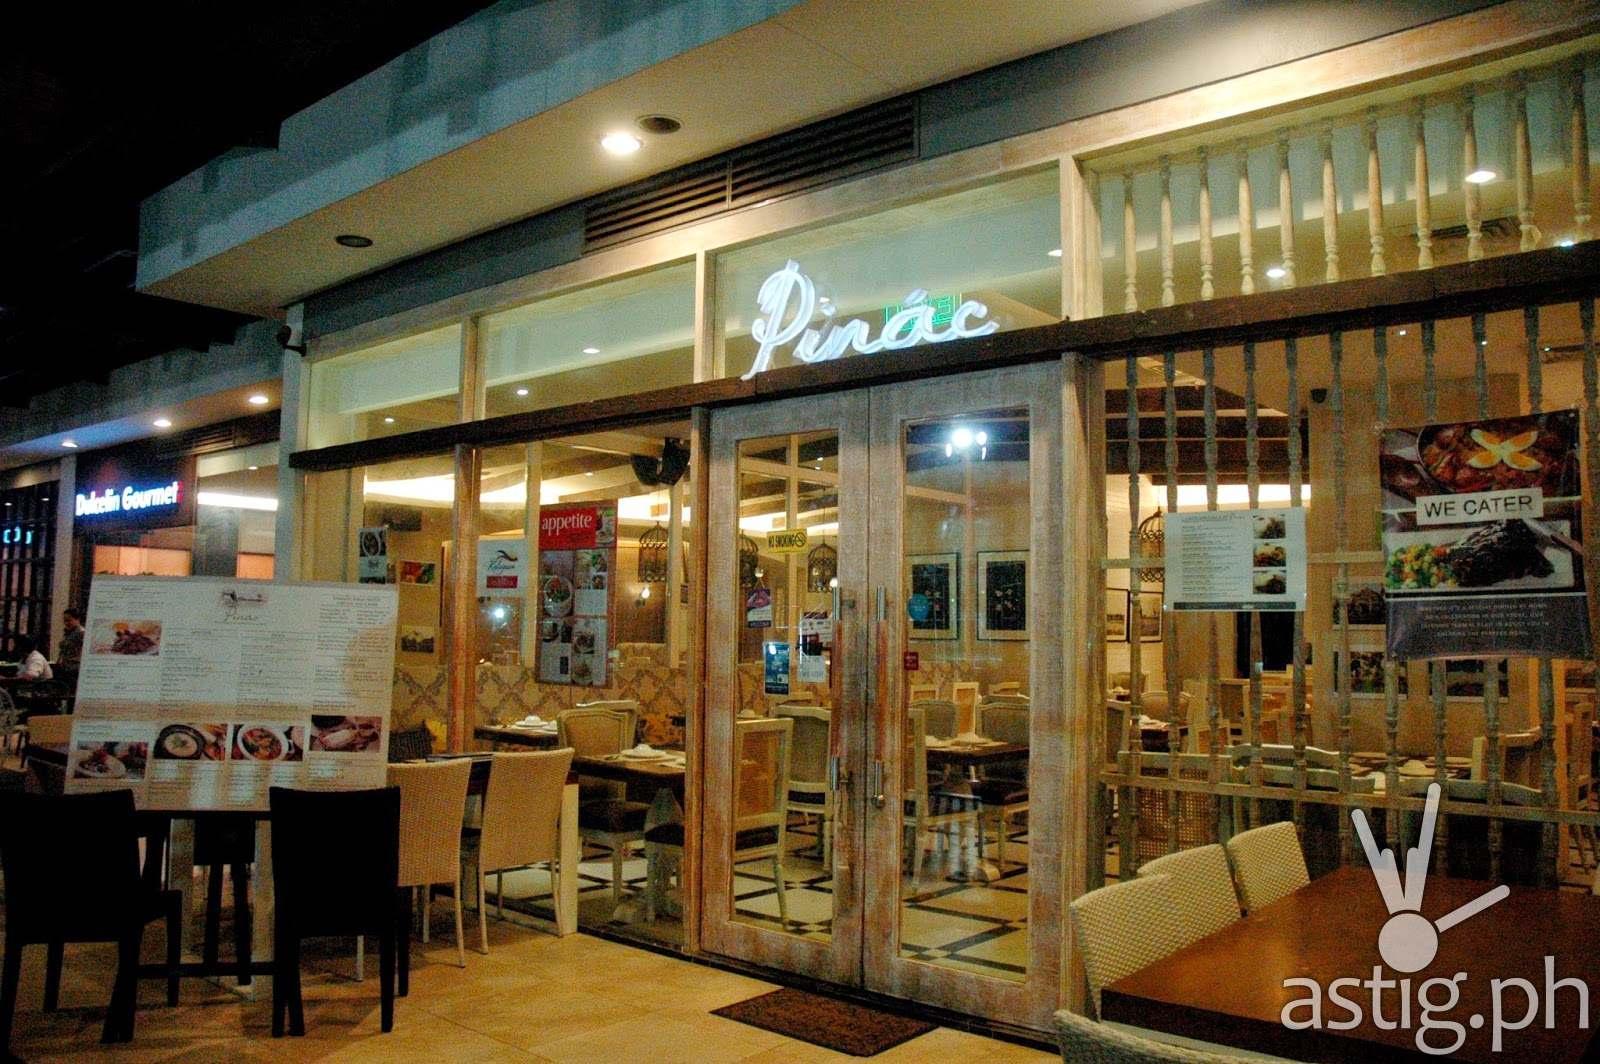 Pinac - Pinac restaurant UP Town Center